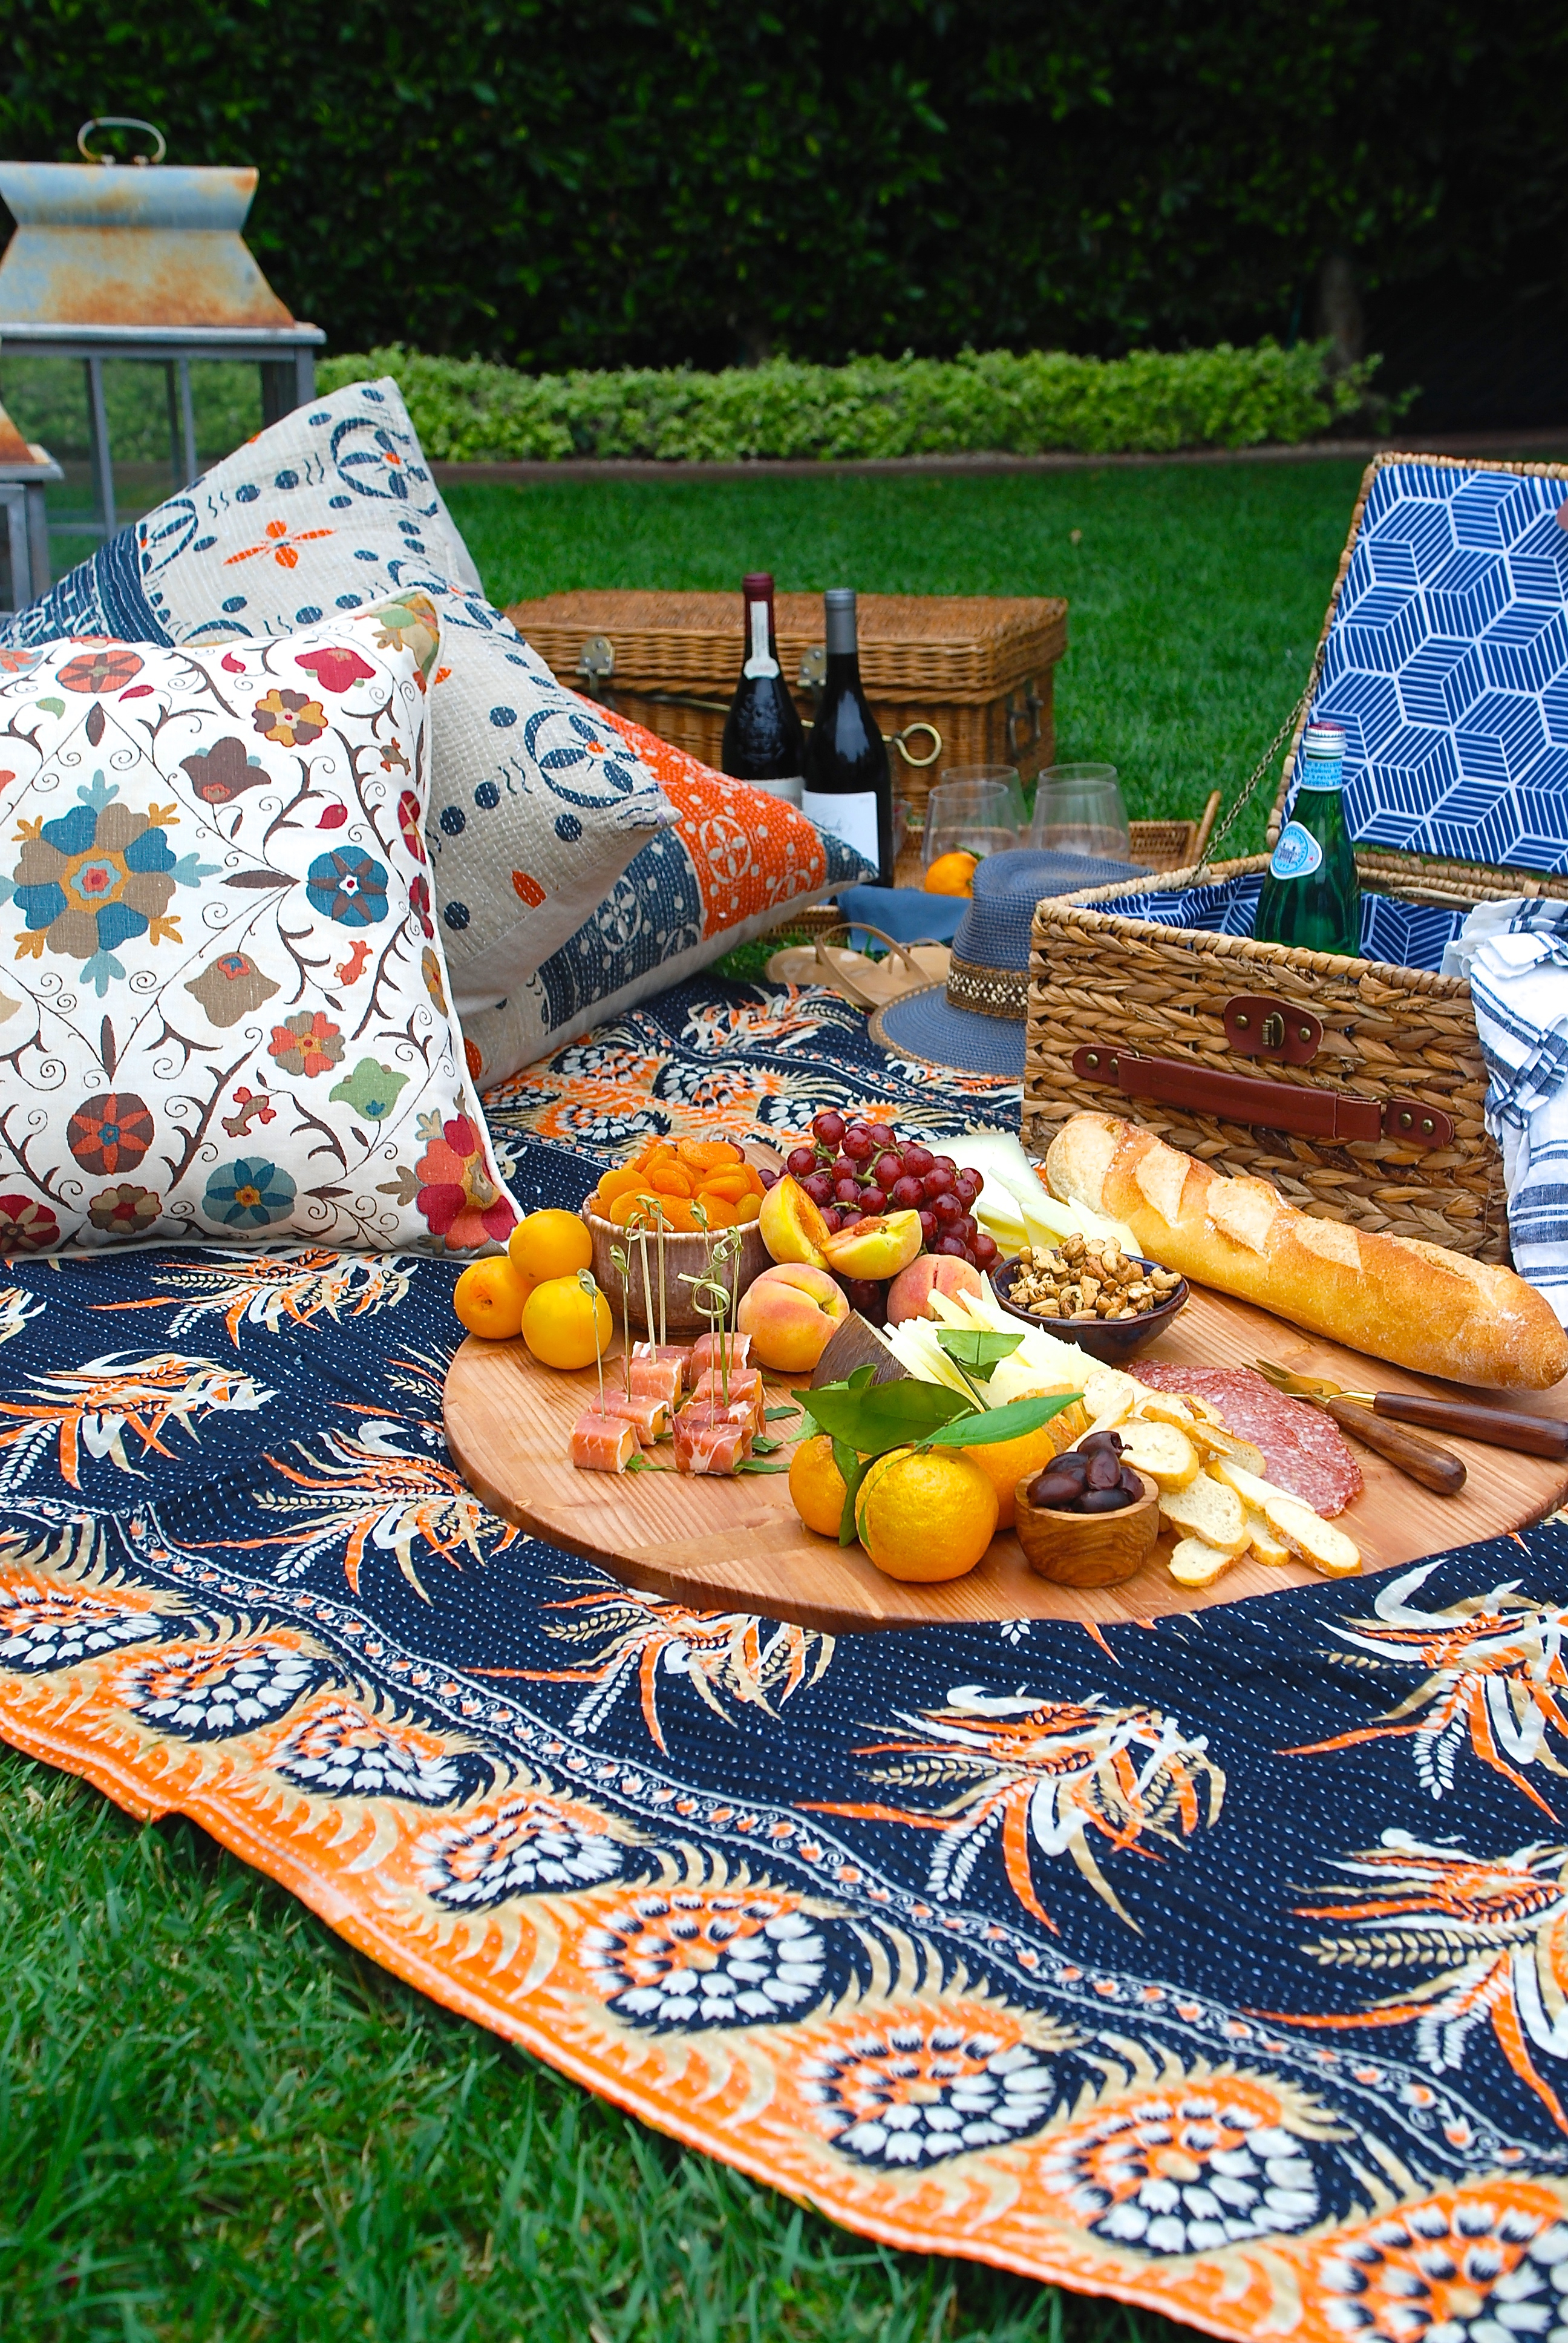 25.SIMPHOME.COM A summer picnic ideas jane can